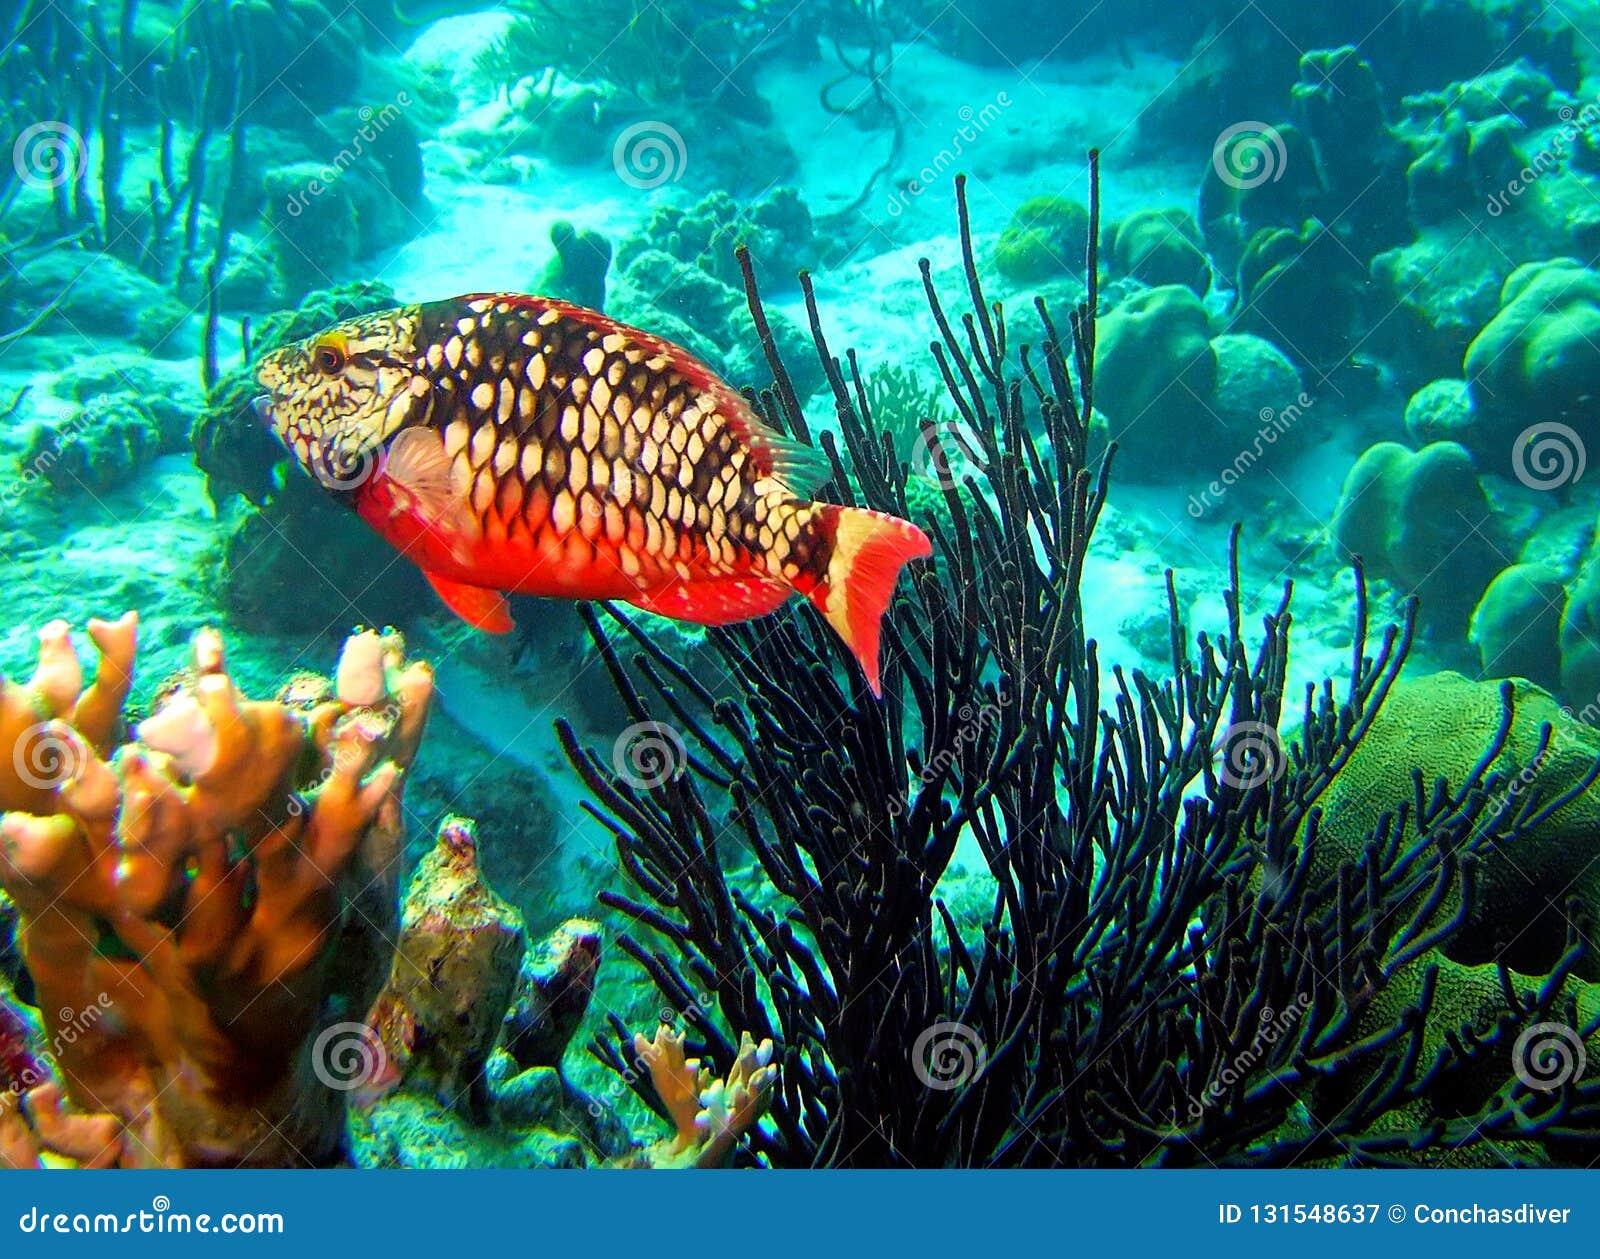 Porthole Stoplight Parrotfish